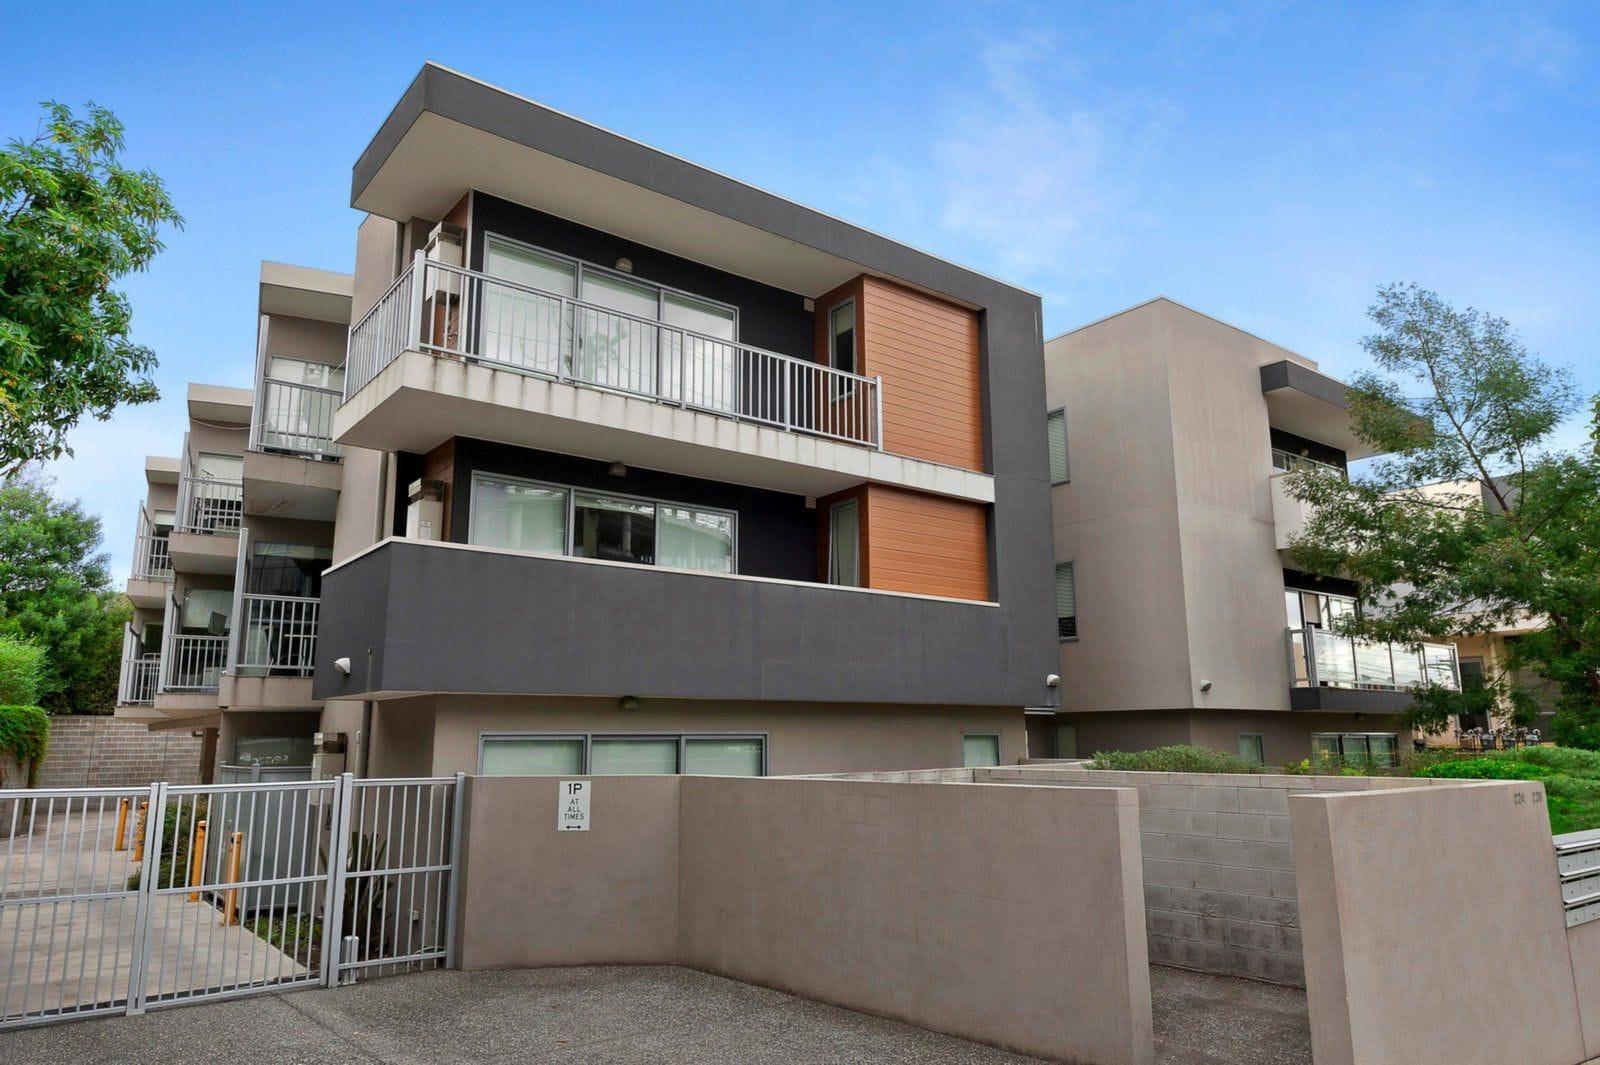 Student Accommodation, Burwood | Global Pacific | Development Australia